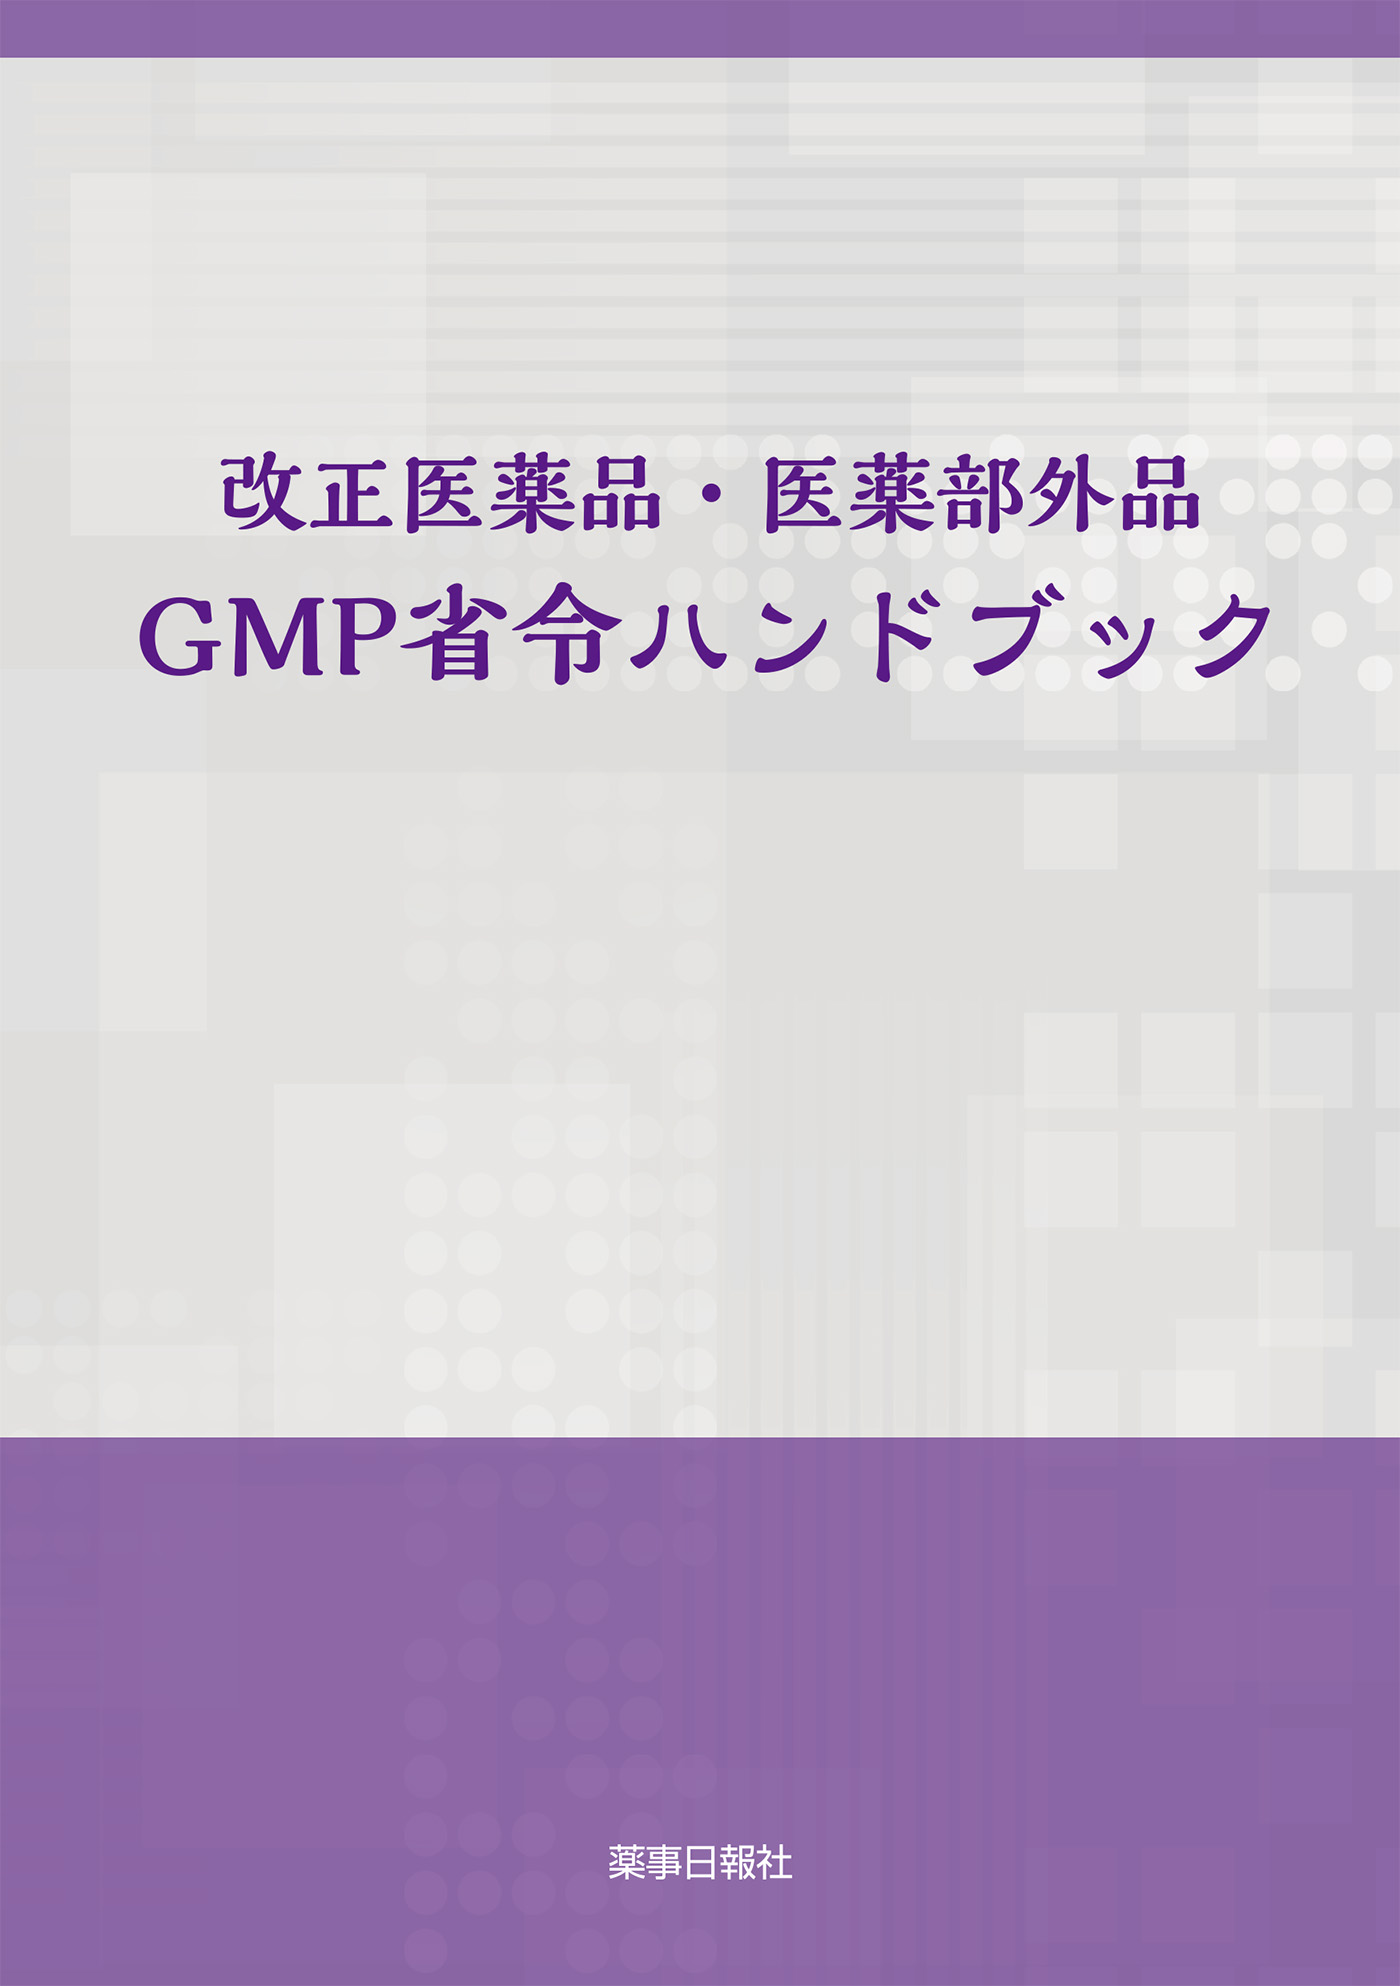 GMP省令ハンドブック